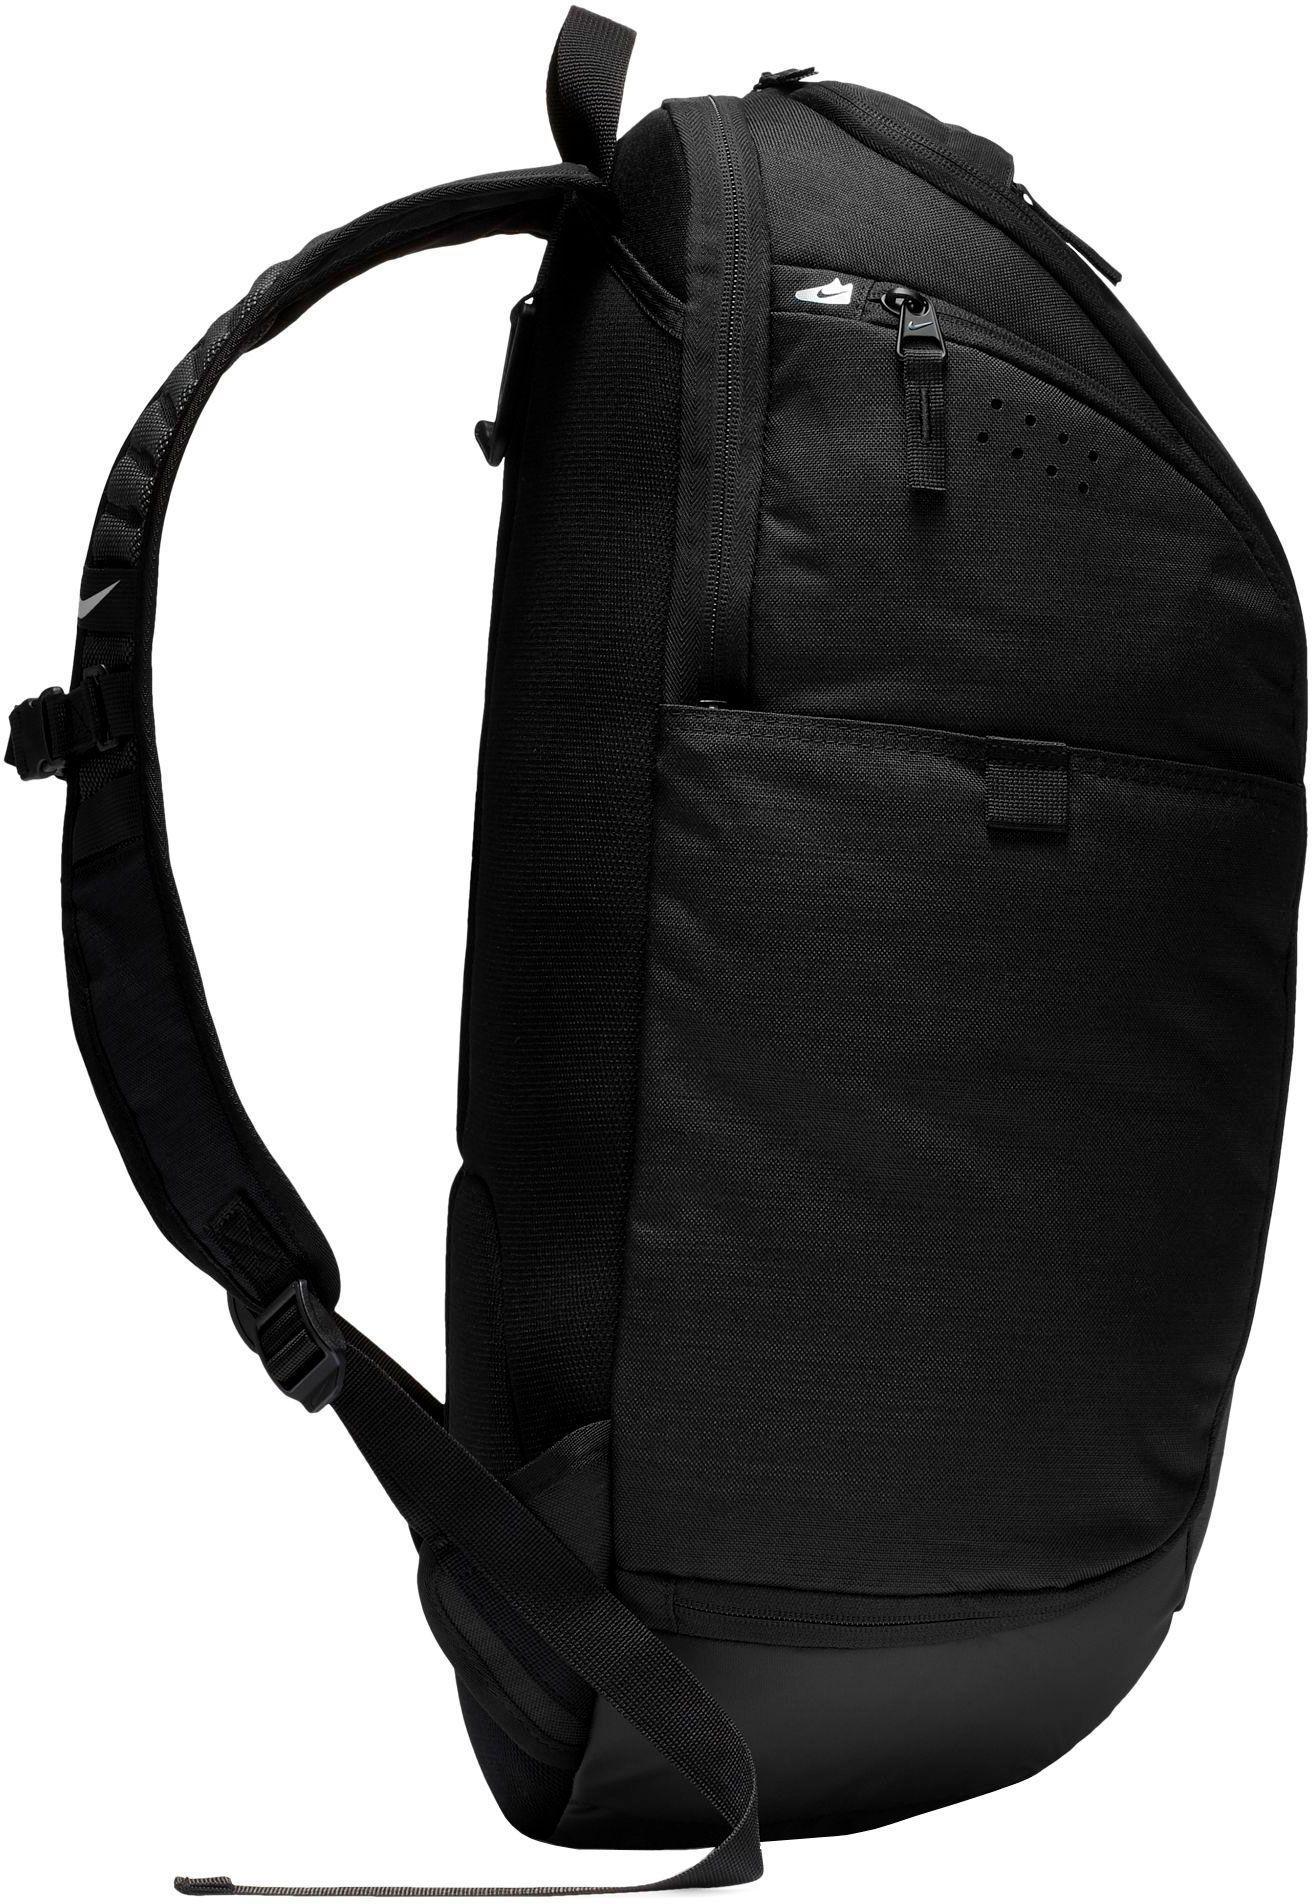 85a8dbba78 Lyst - Nike Hoops Elite Pro Basketball Backpack in Black for Men